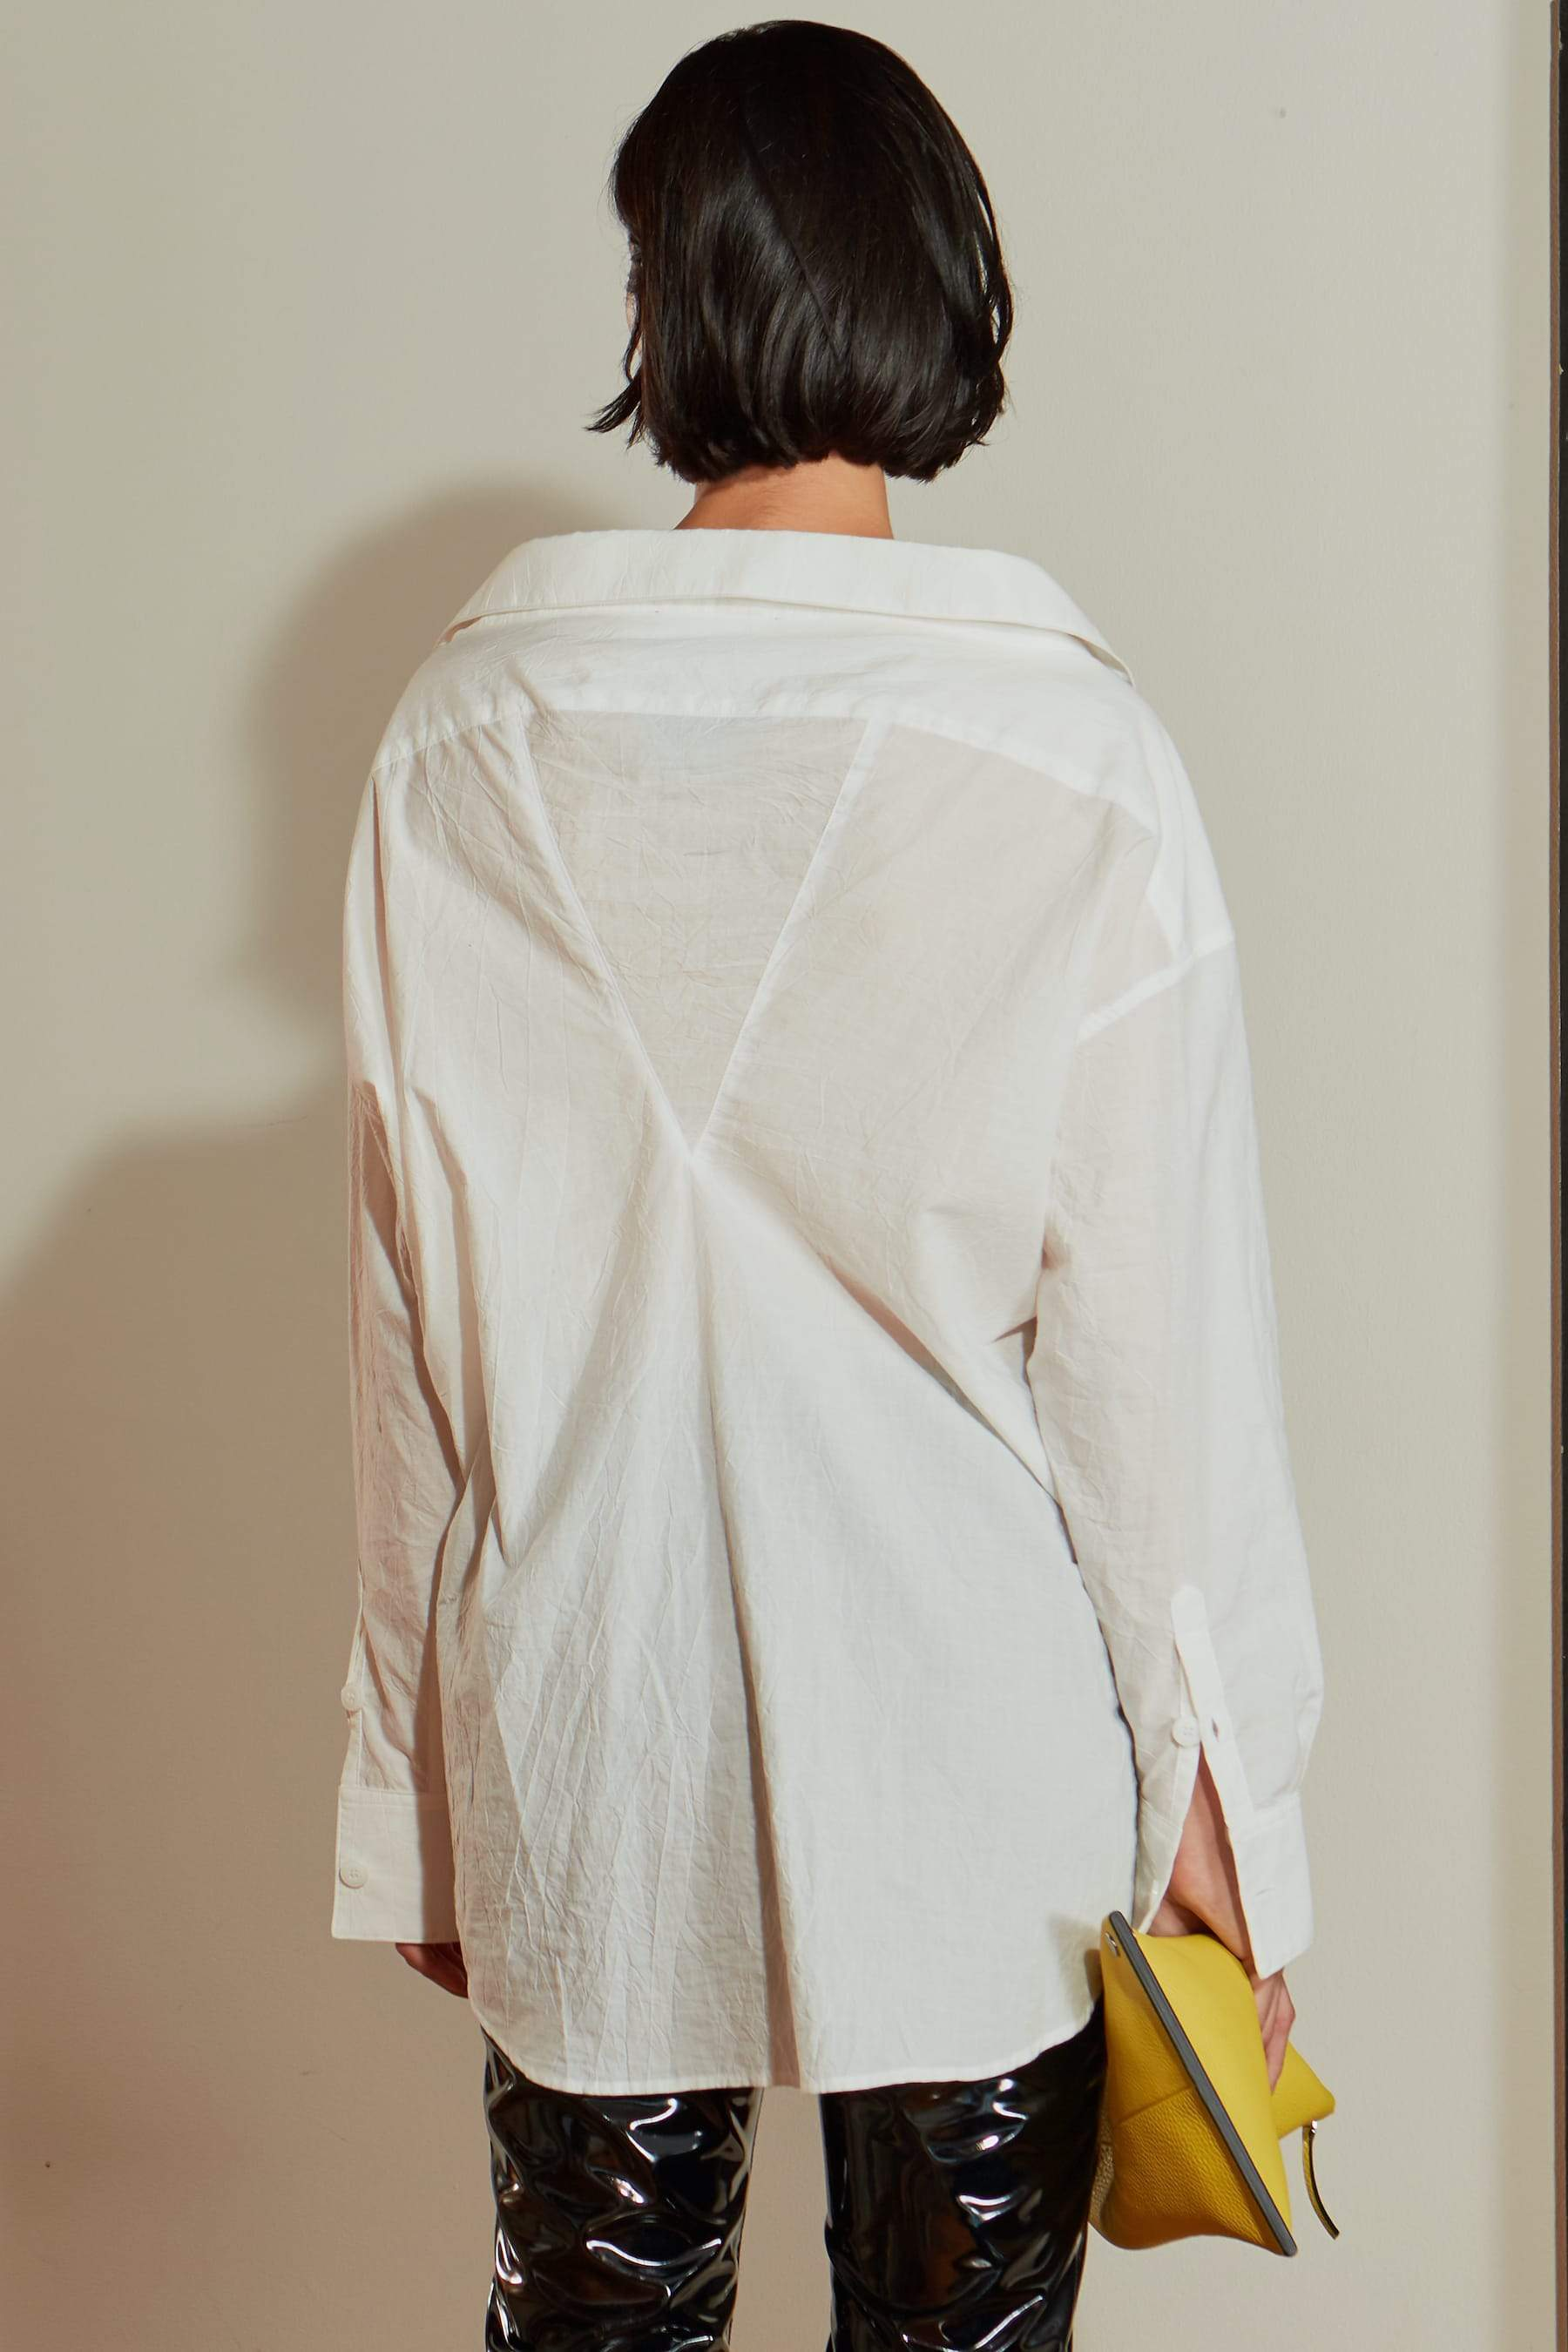 Tabor Shirt in White by Simon Miller - 5